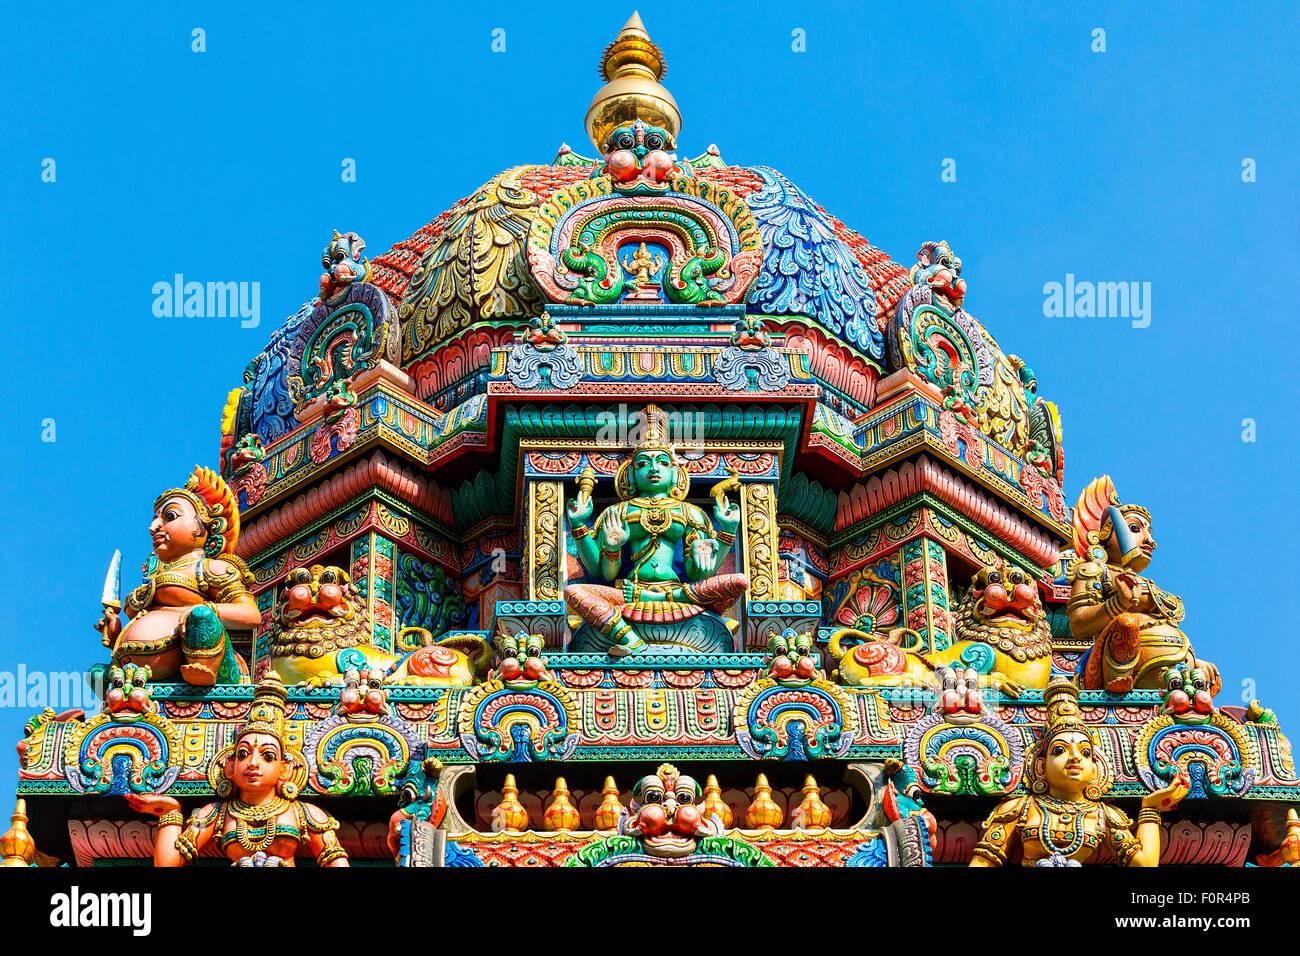 Thailand, Bangkok, Sri Maha Mariamman temple Stock Photo, Royalty Free Image:...